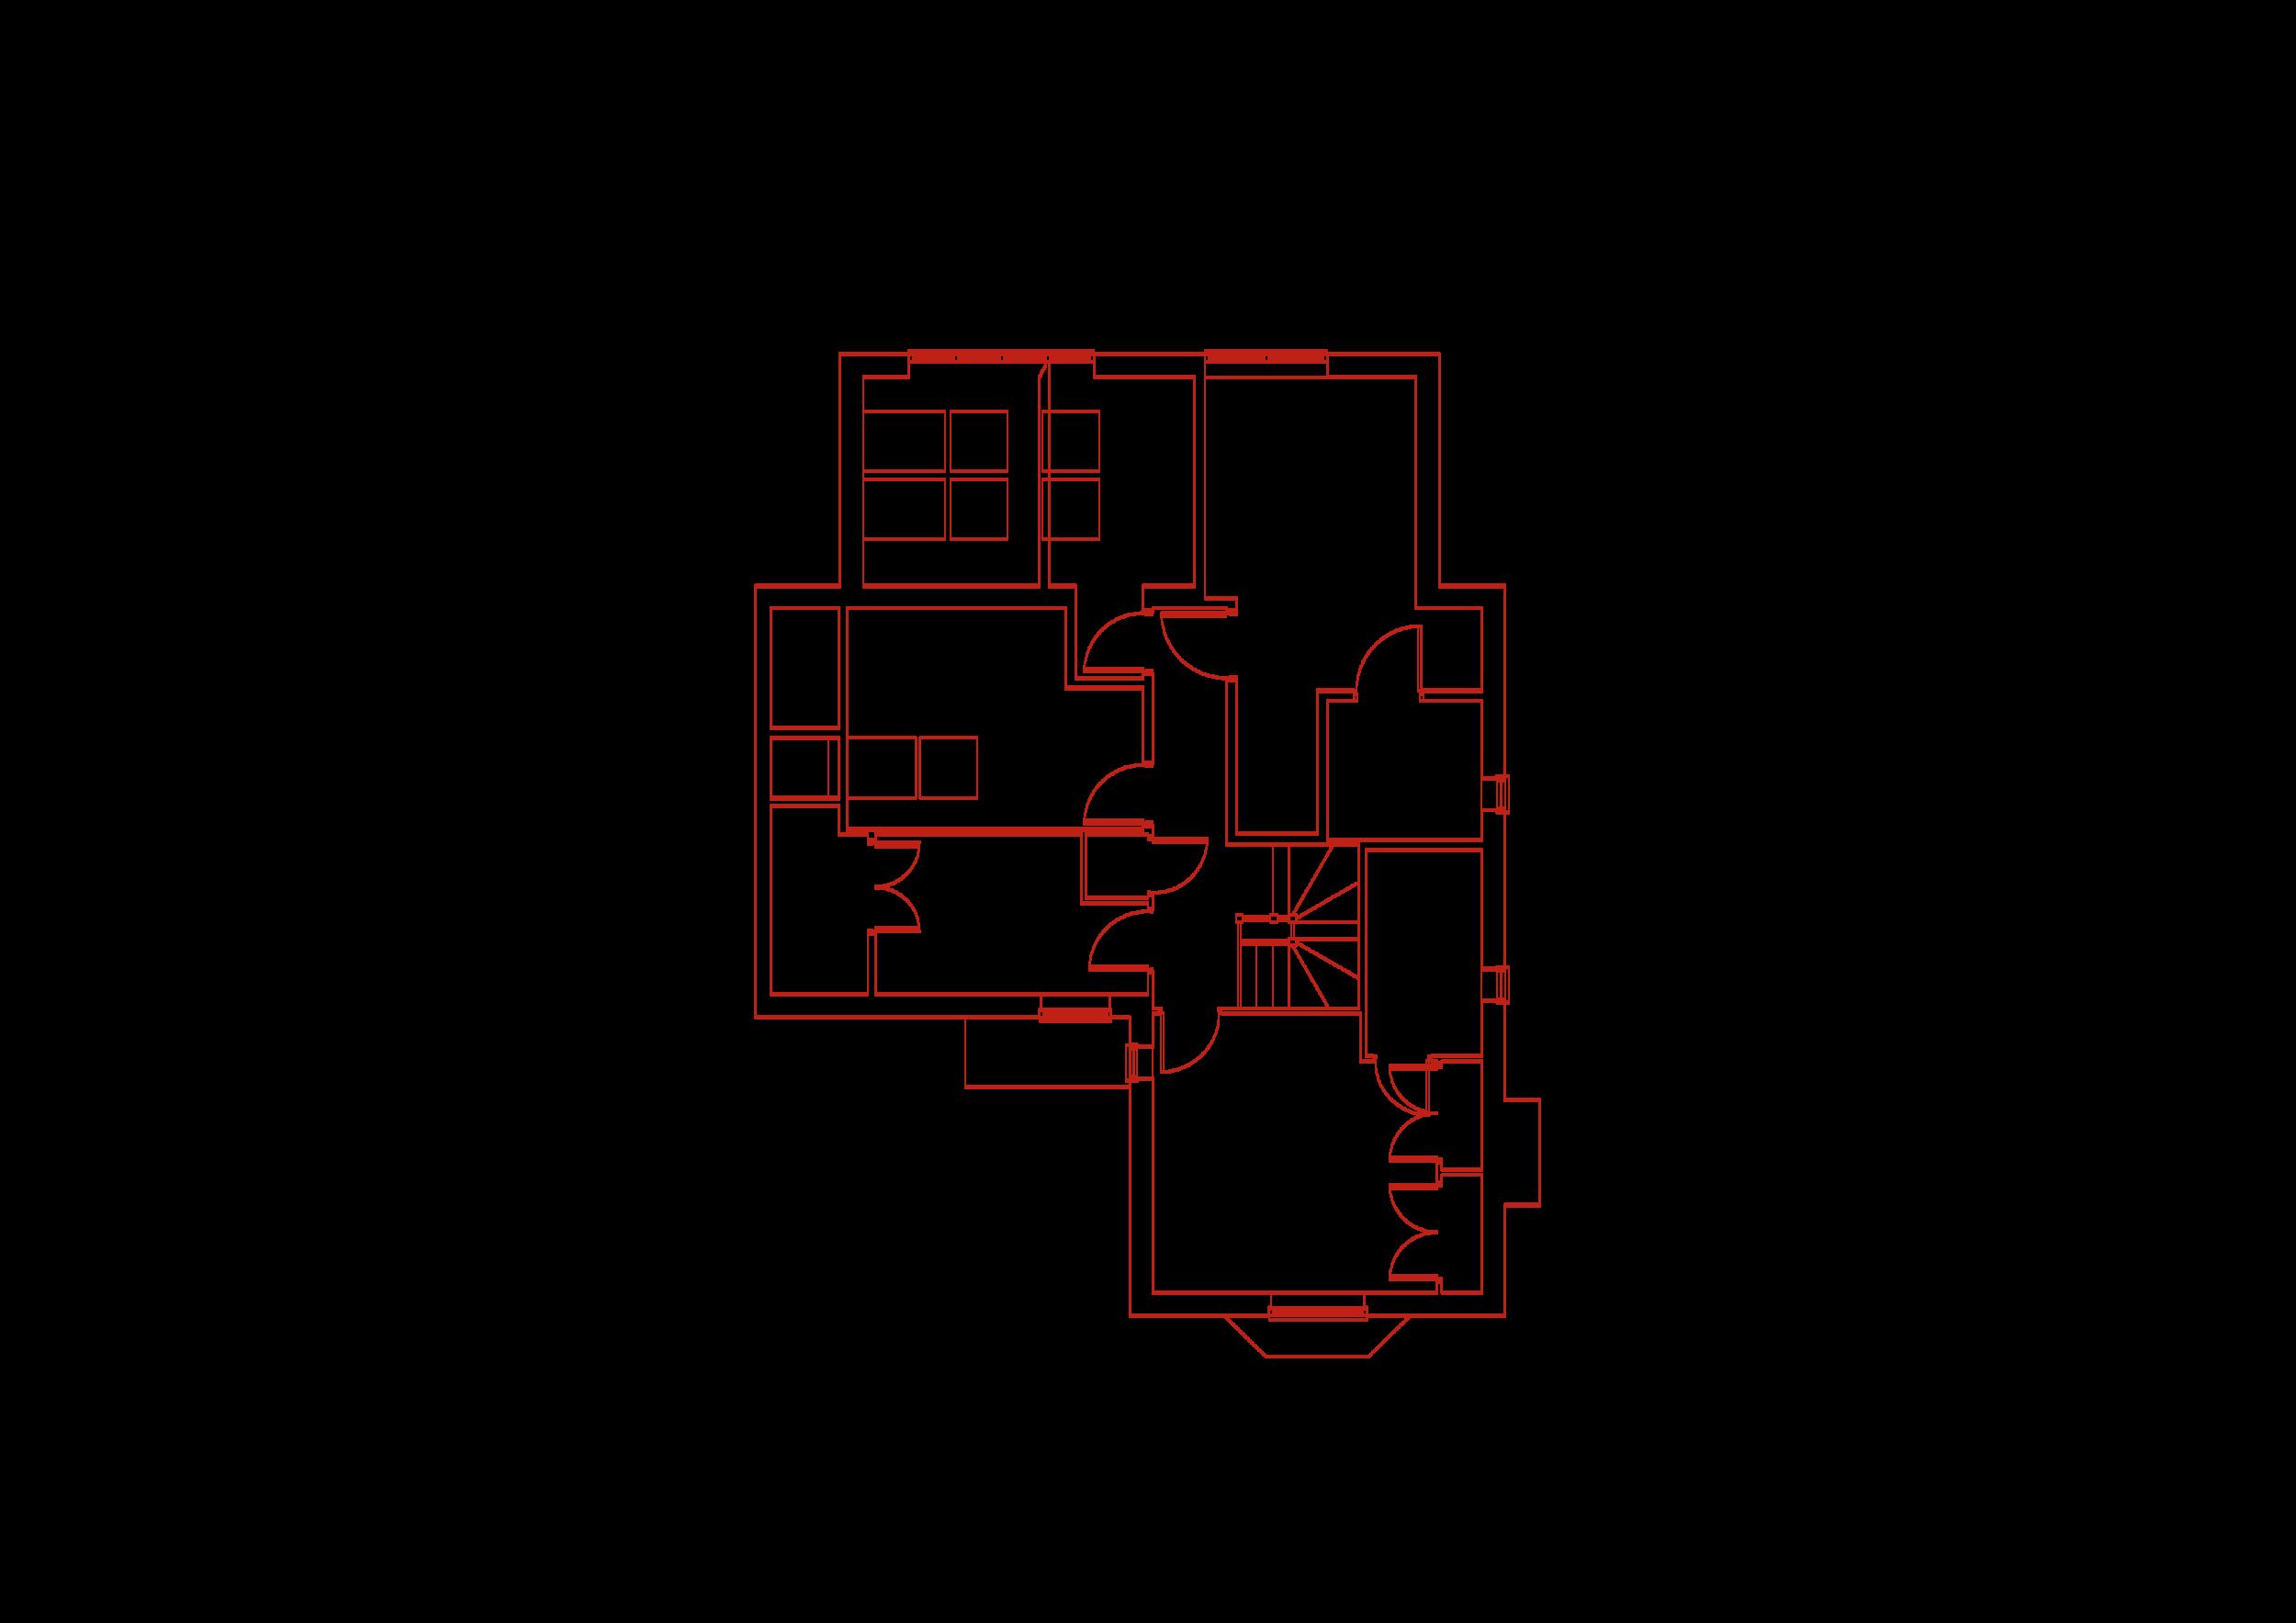 Speedwell House Plan 4 - Beverley Architects - Samuel Kendall Associates.png